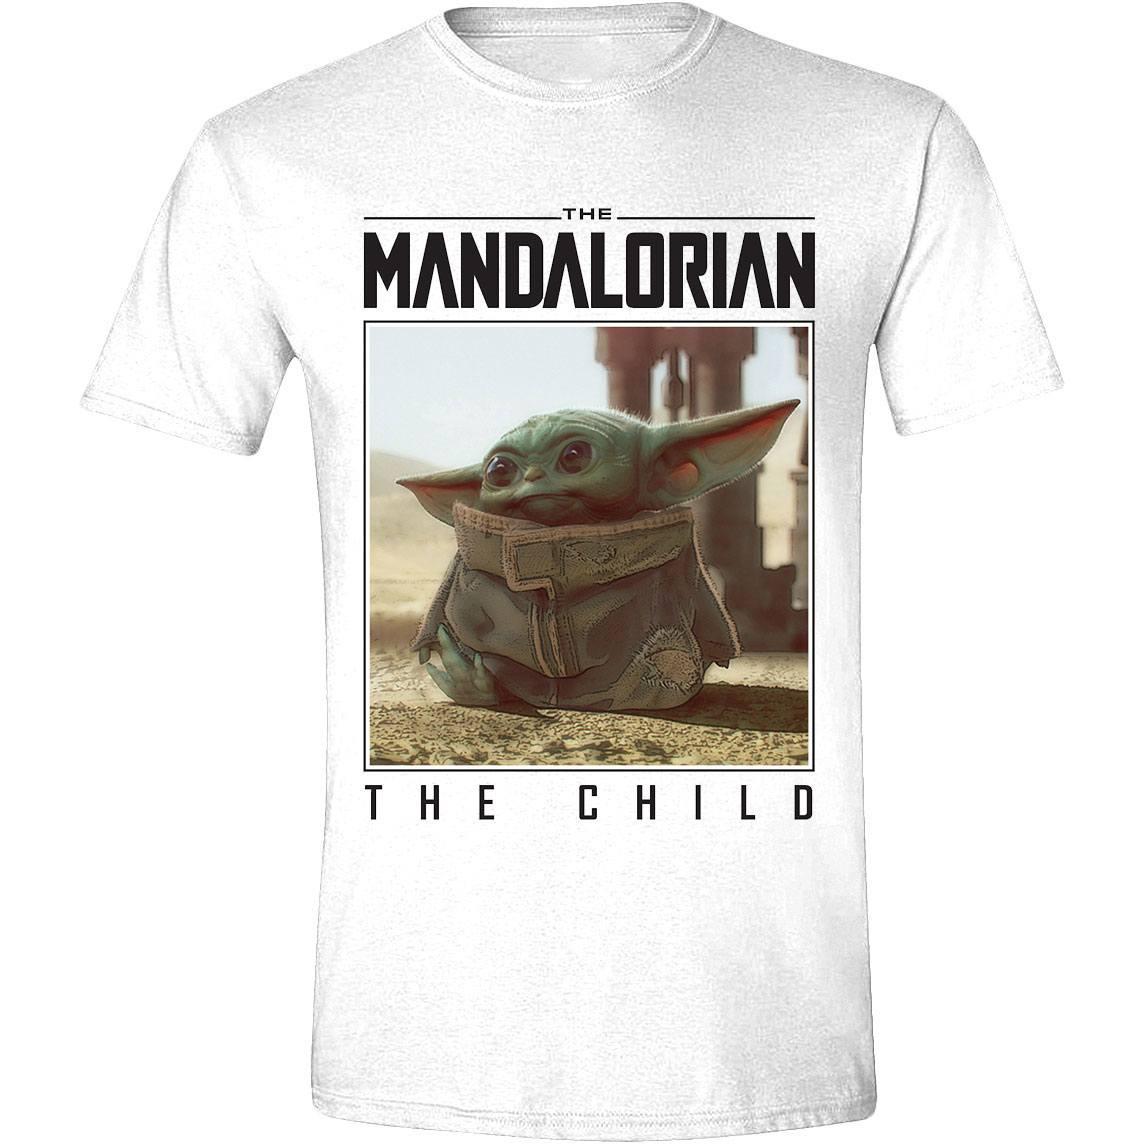 Star Wars The Mandalorian T-Shirt The Child Photo Size L